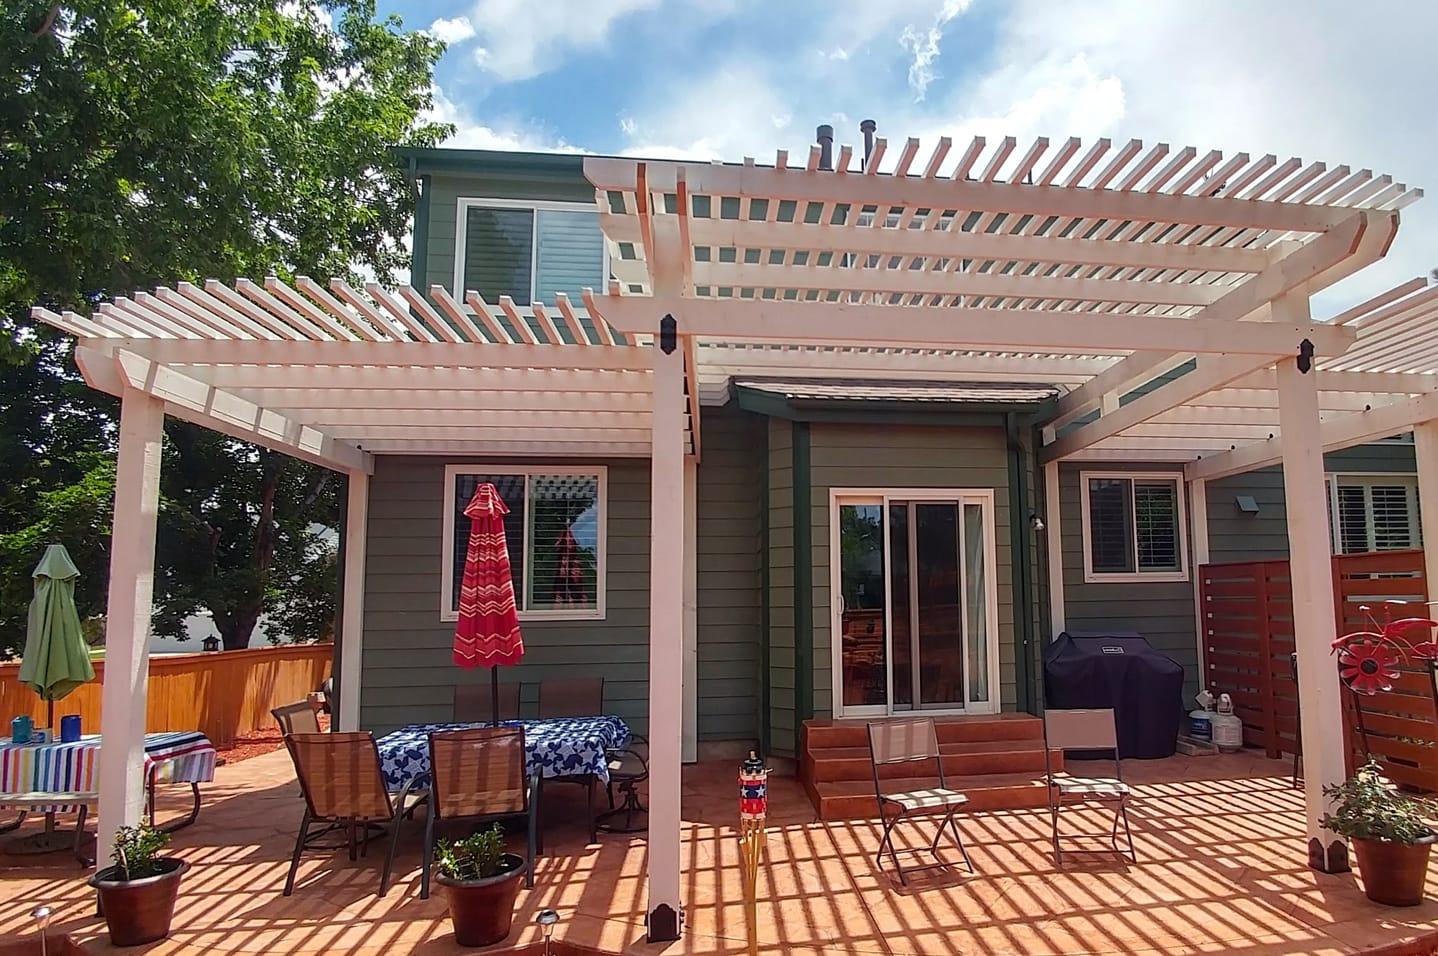 Installer Colorado Shade Structures, Lone Tree, CO